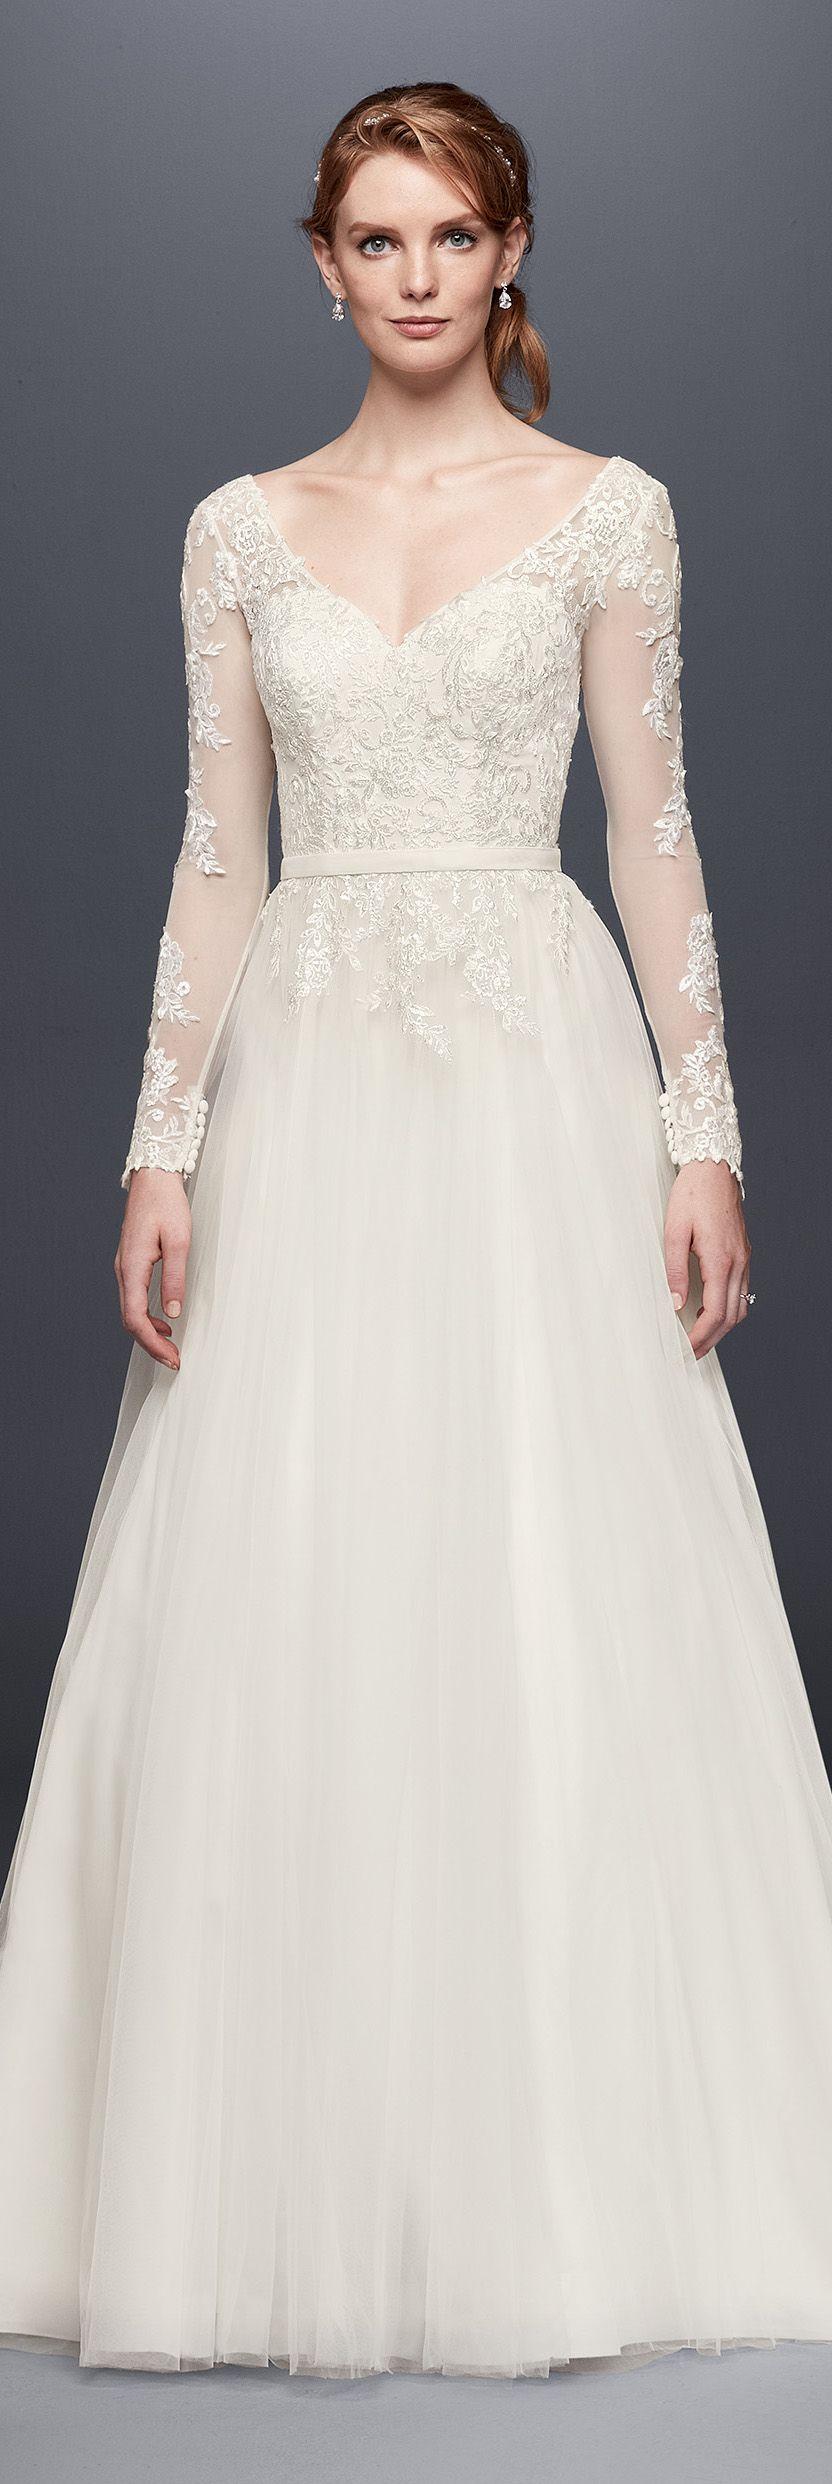 Bridal wedding dresses  Long Sleeve Wedding Dress With Low Back  Davidus Bridal Spring